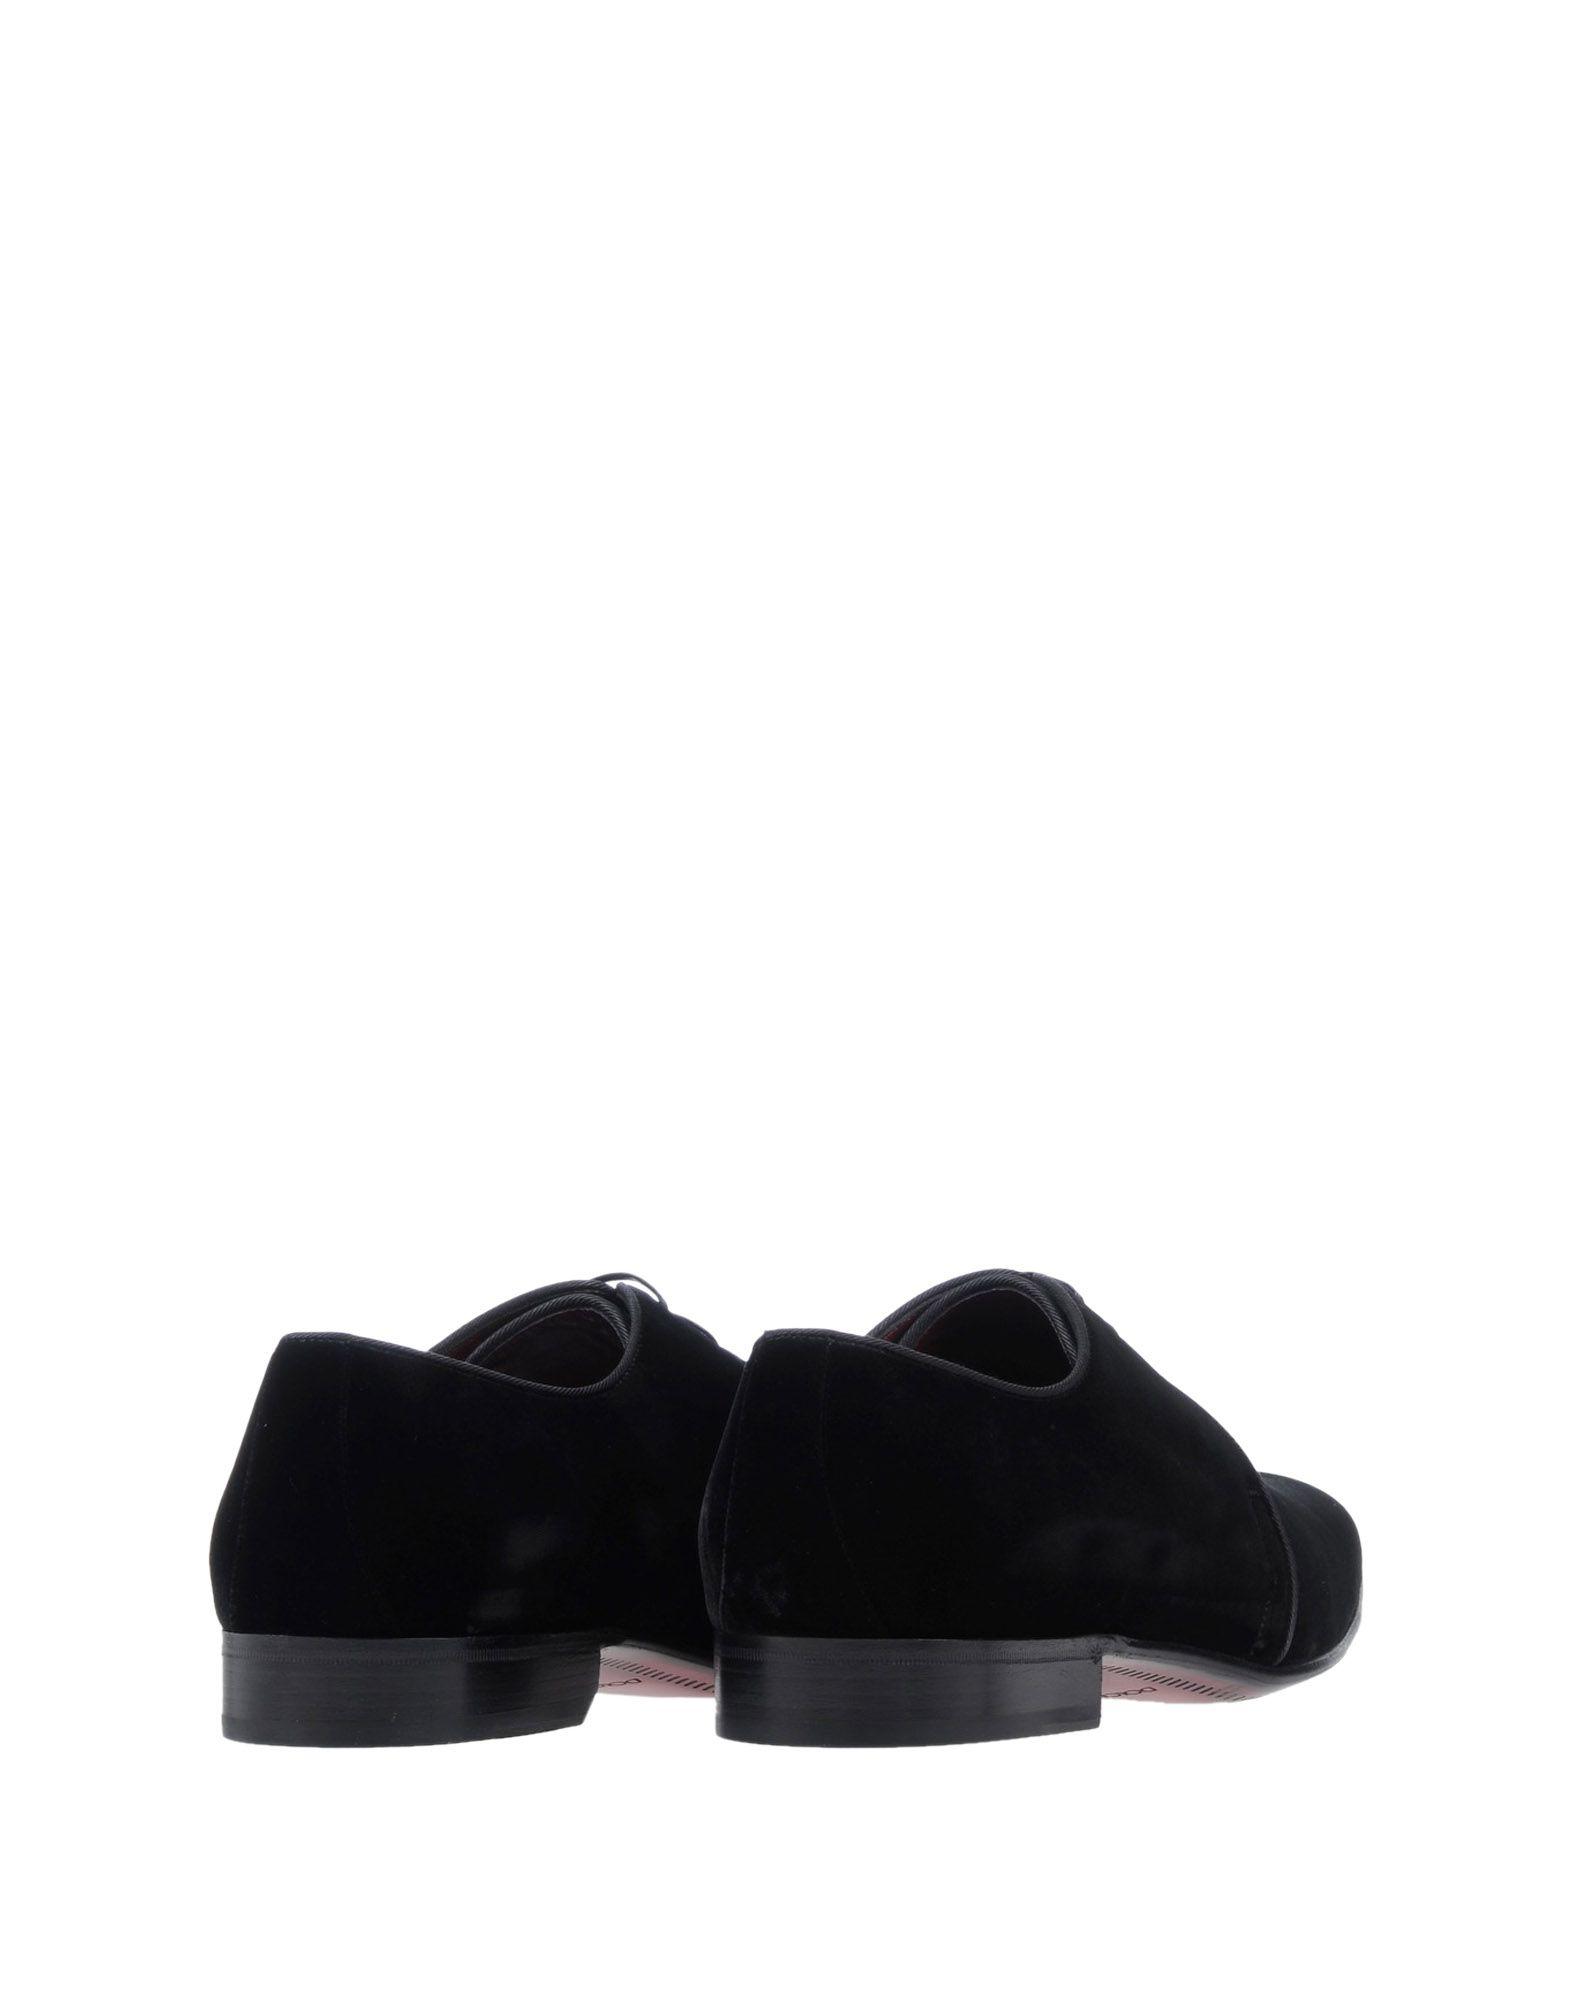 Dolce & Gabbana Schnürschuhe Herren  11222922AA Gute Qualität beliebte Schuhe